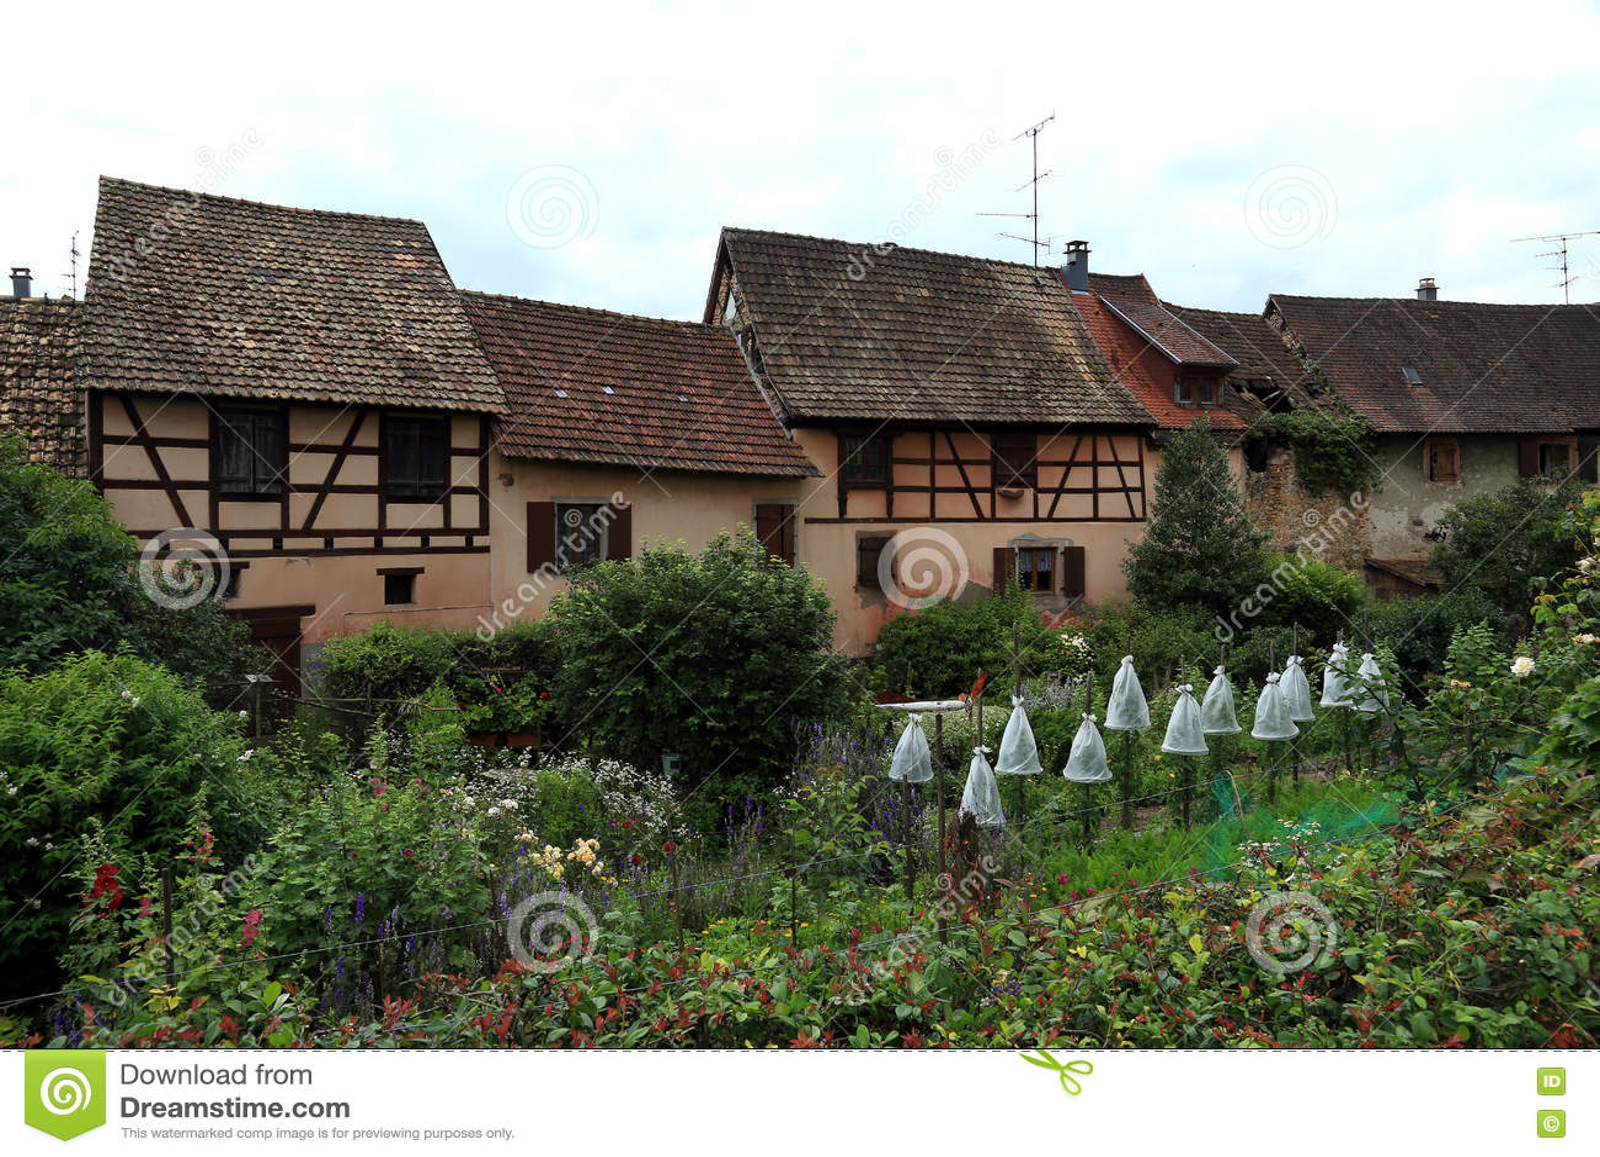 Alte Bauernhäuser In Elsass, Frankreich Stockbild - Bild